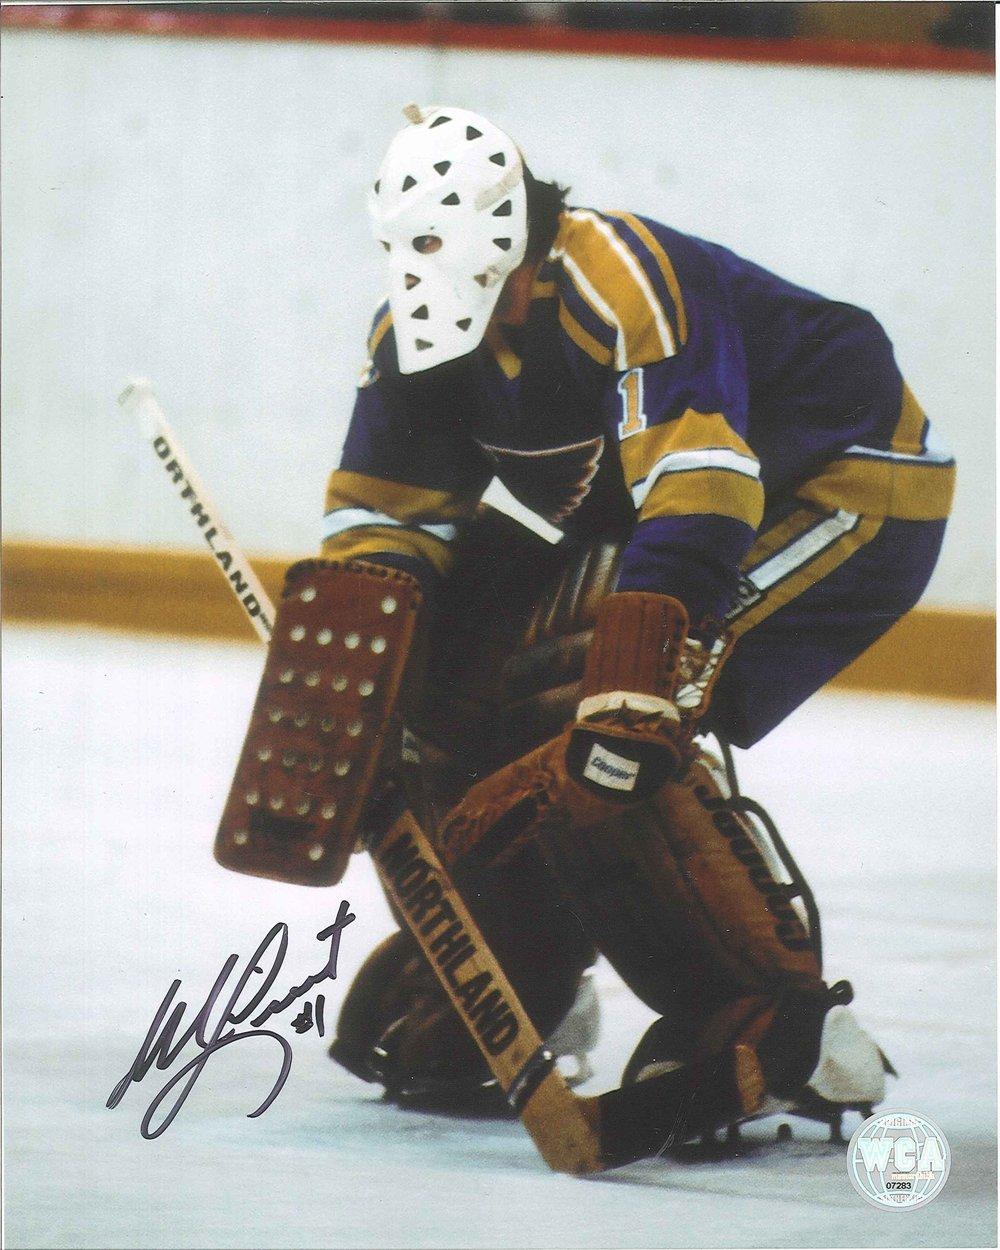 West_Coast_Authentic_NHL_Blues_Mike_Liut_Autographed_Photo4.jpg